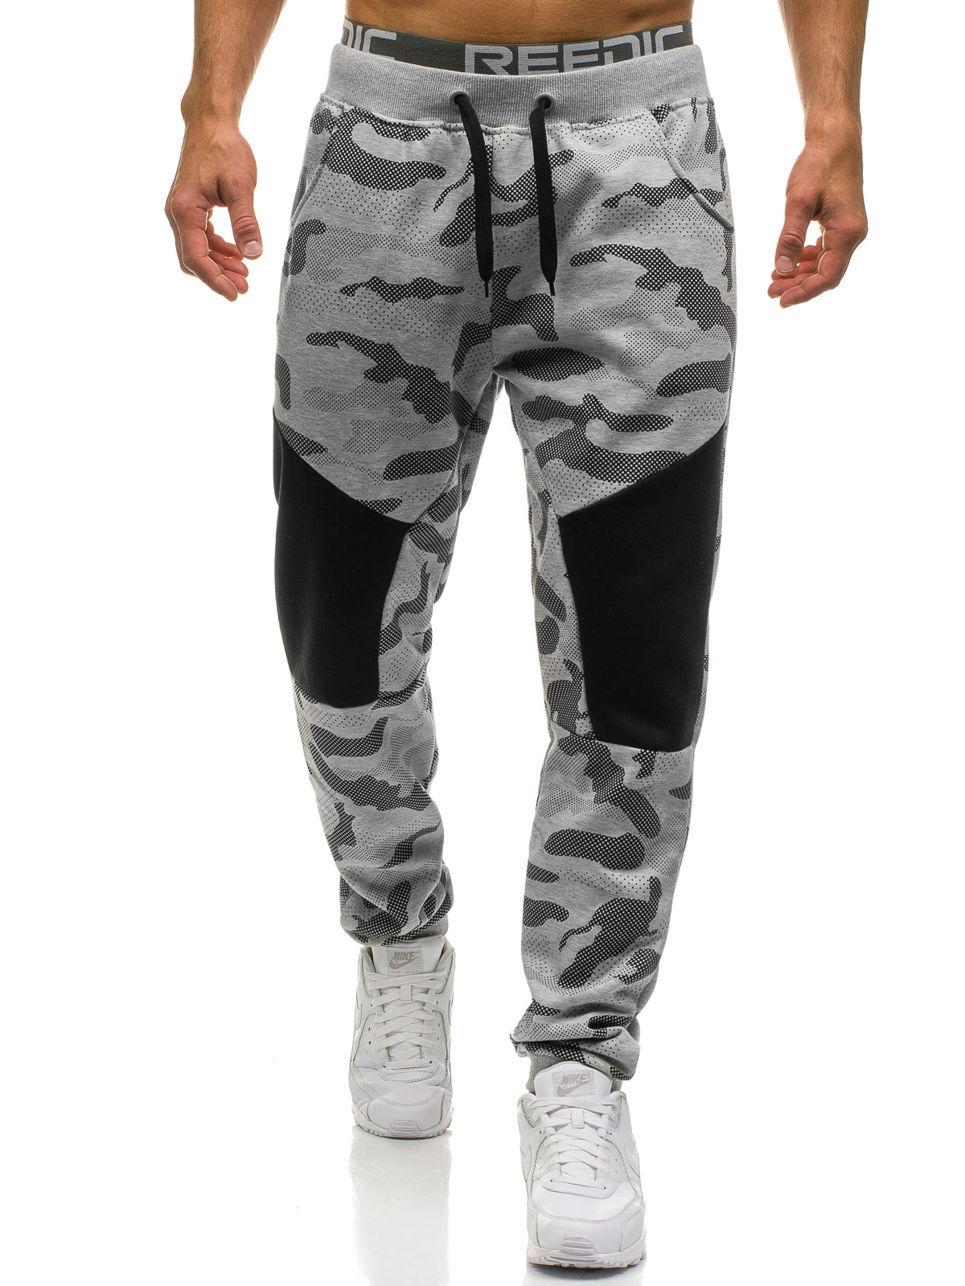 2019 New Stretch Sweatpants Men Camo Jogger Pants Men's Trousers Camouflage Joggers Male Track Pants Mens Sweat Pants